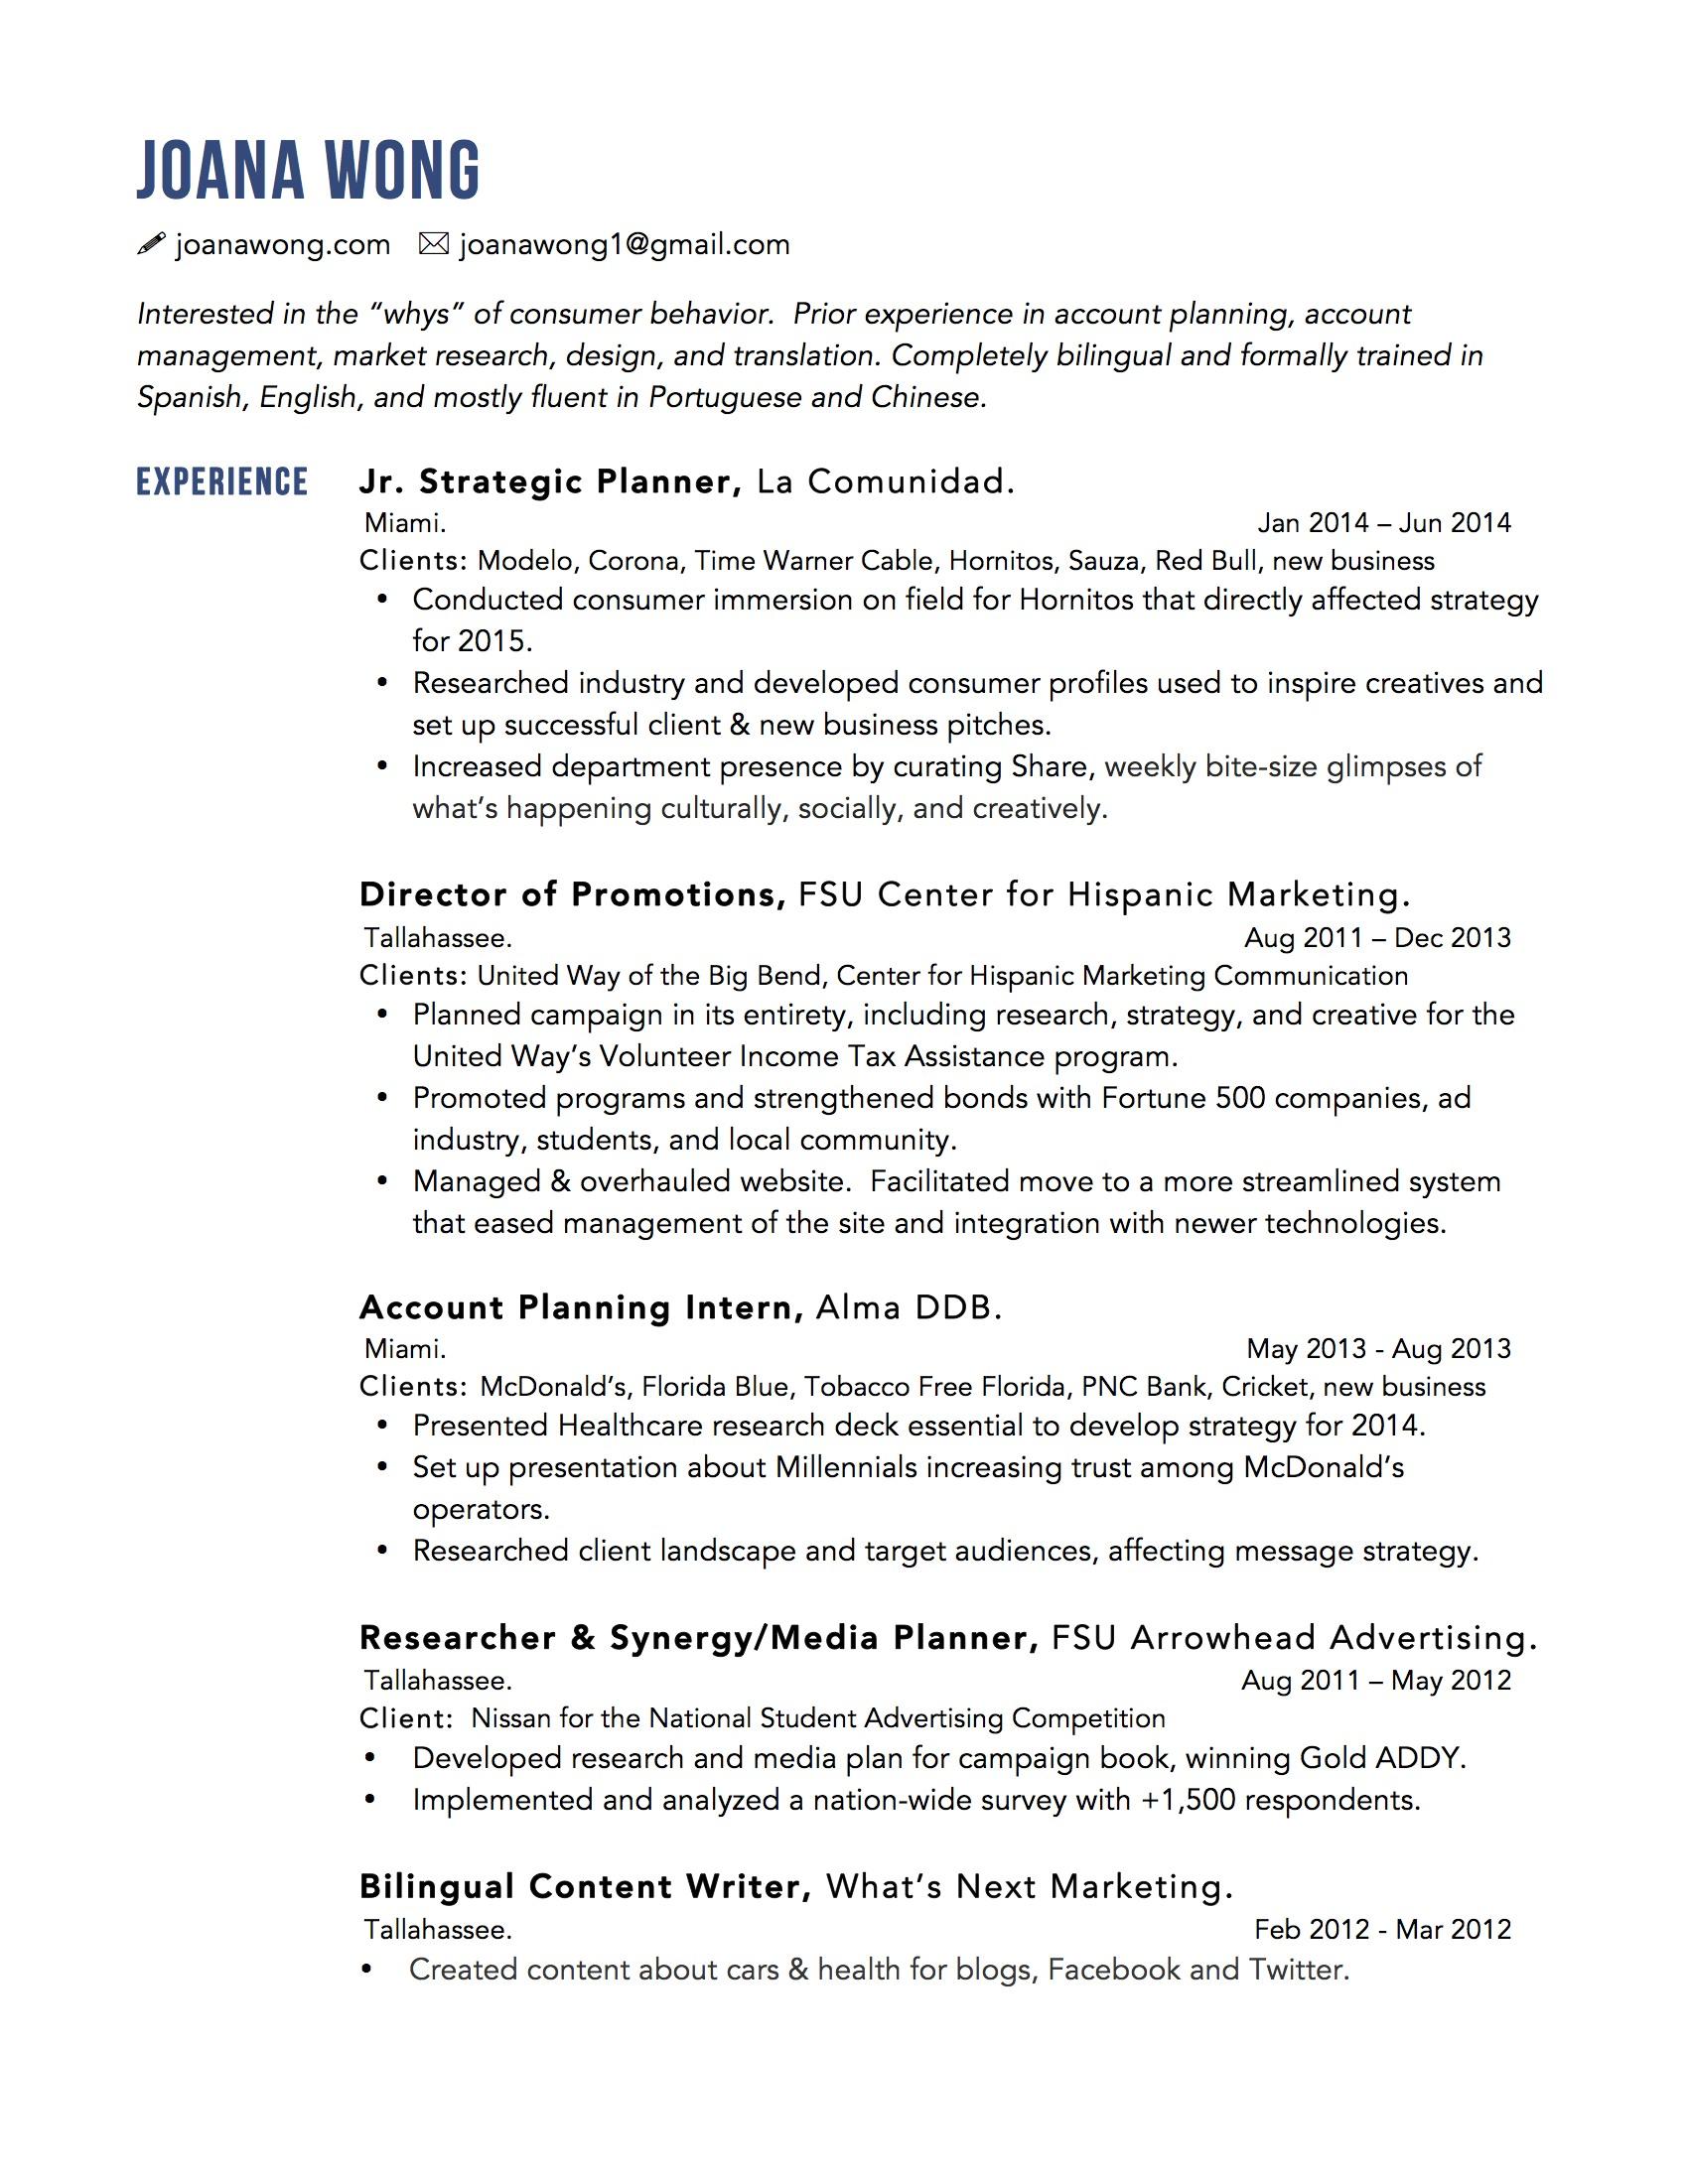 Account Manager Resume Examples   Best Resume Sample DigitalMarketer